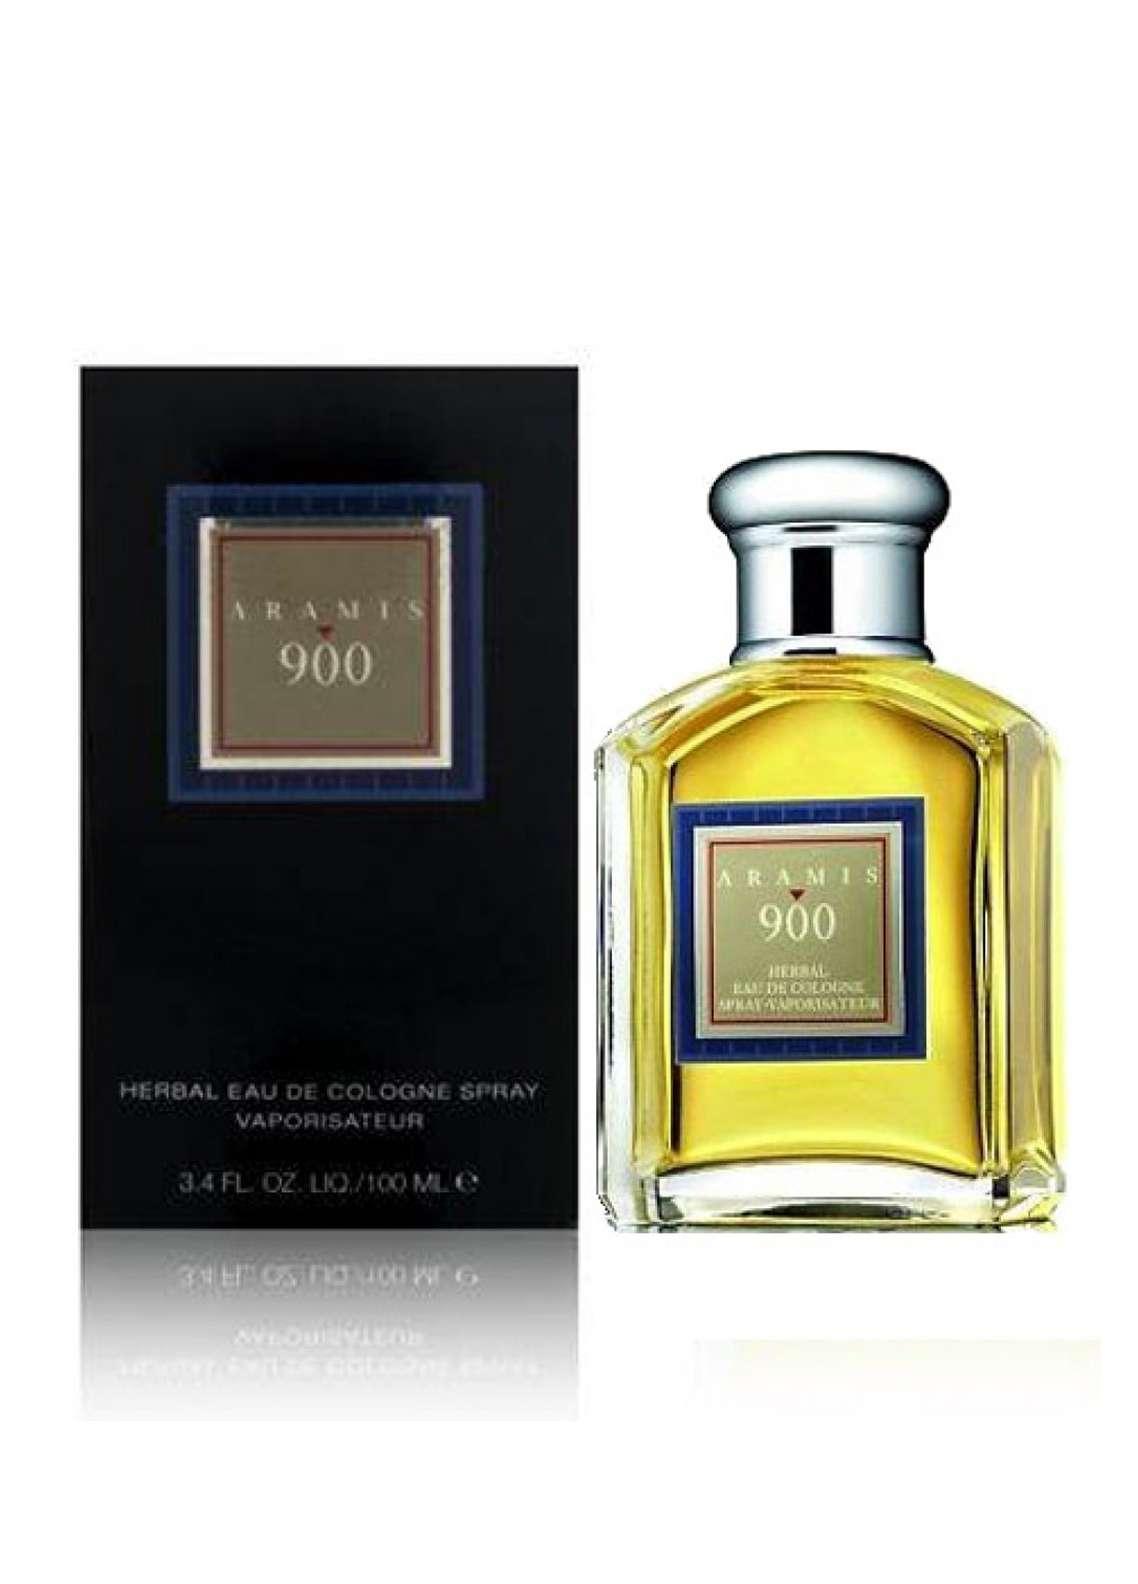 Aramis Herbal Eau De Cologne Spray Vaporisateur men's perfume